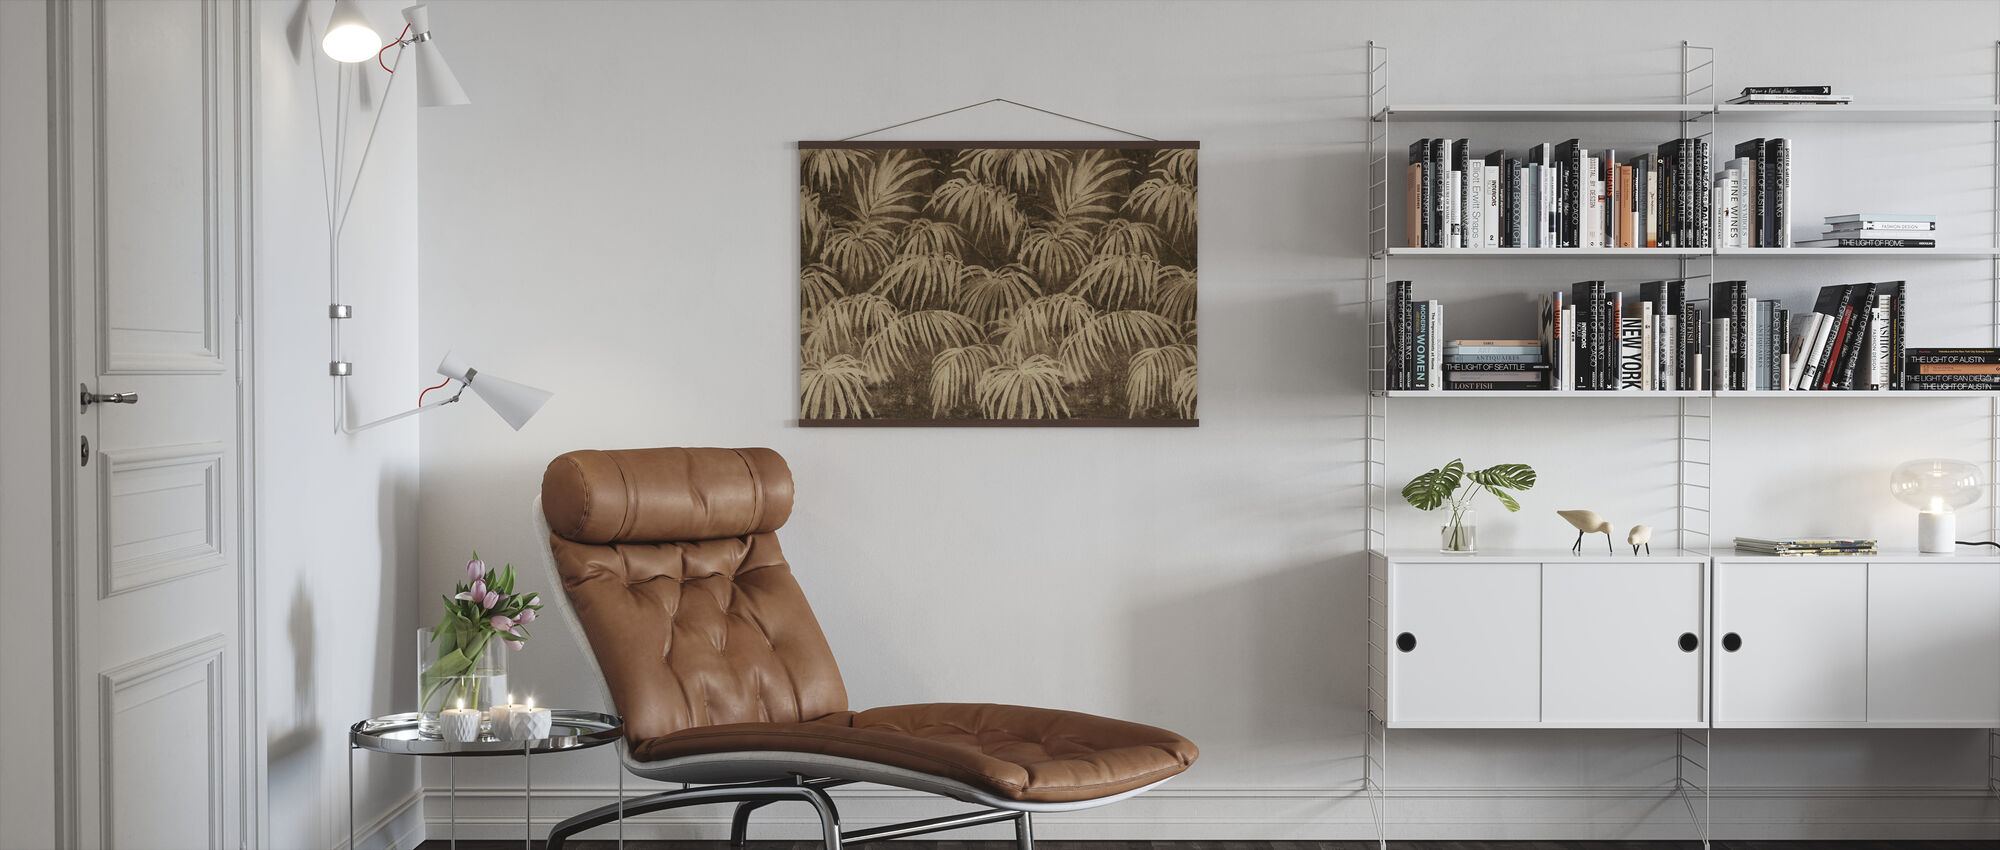 Bohemian Bamboo - Poster - Living Room